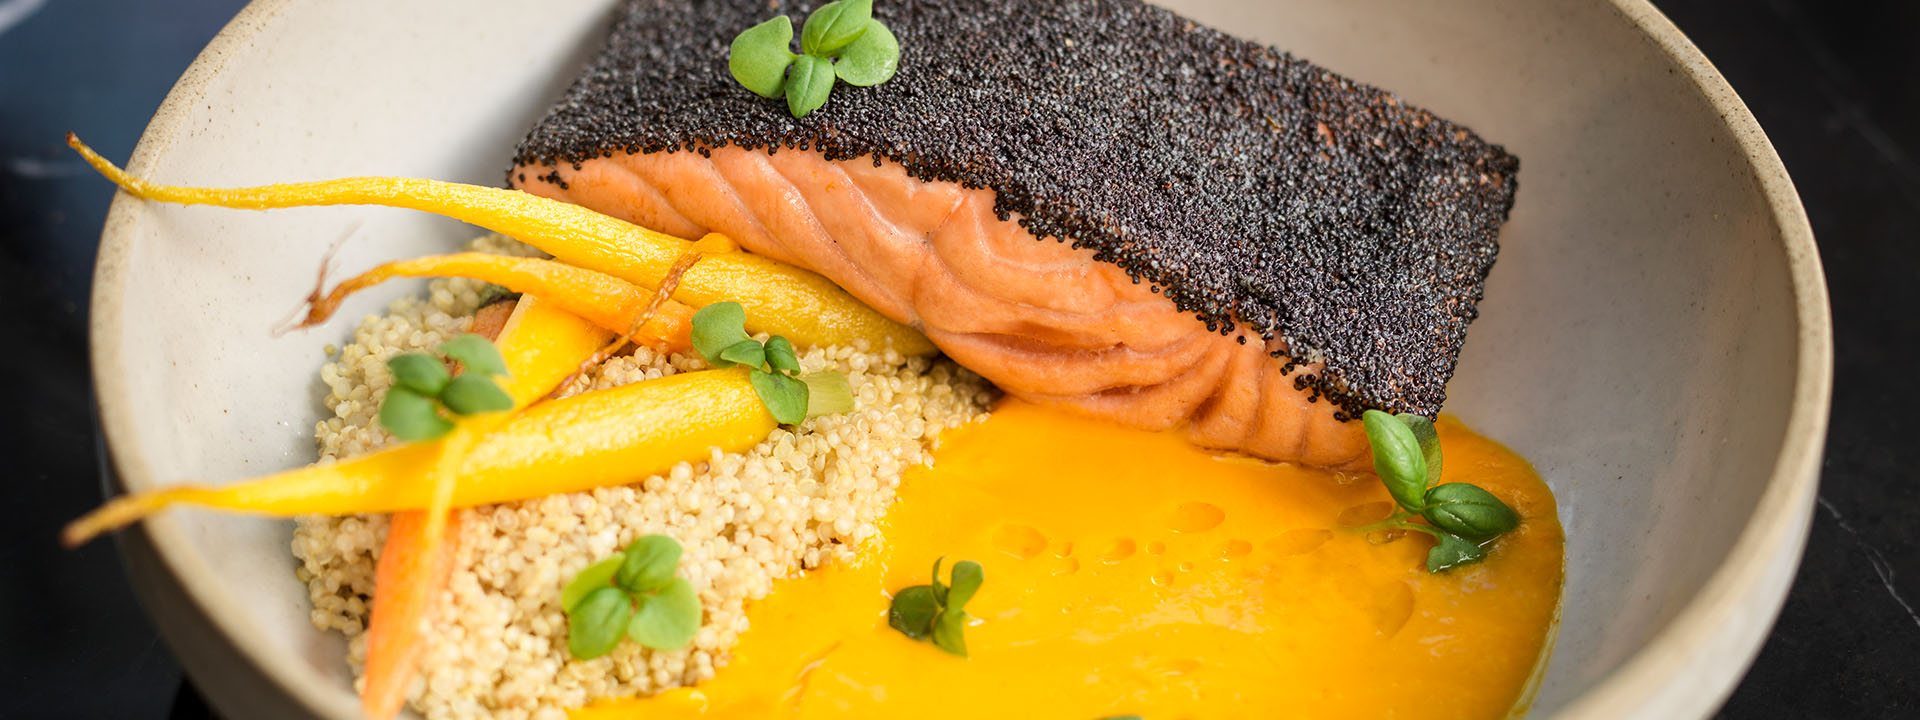 Jean-Georges Salmon dish